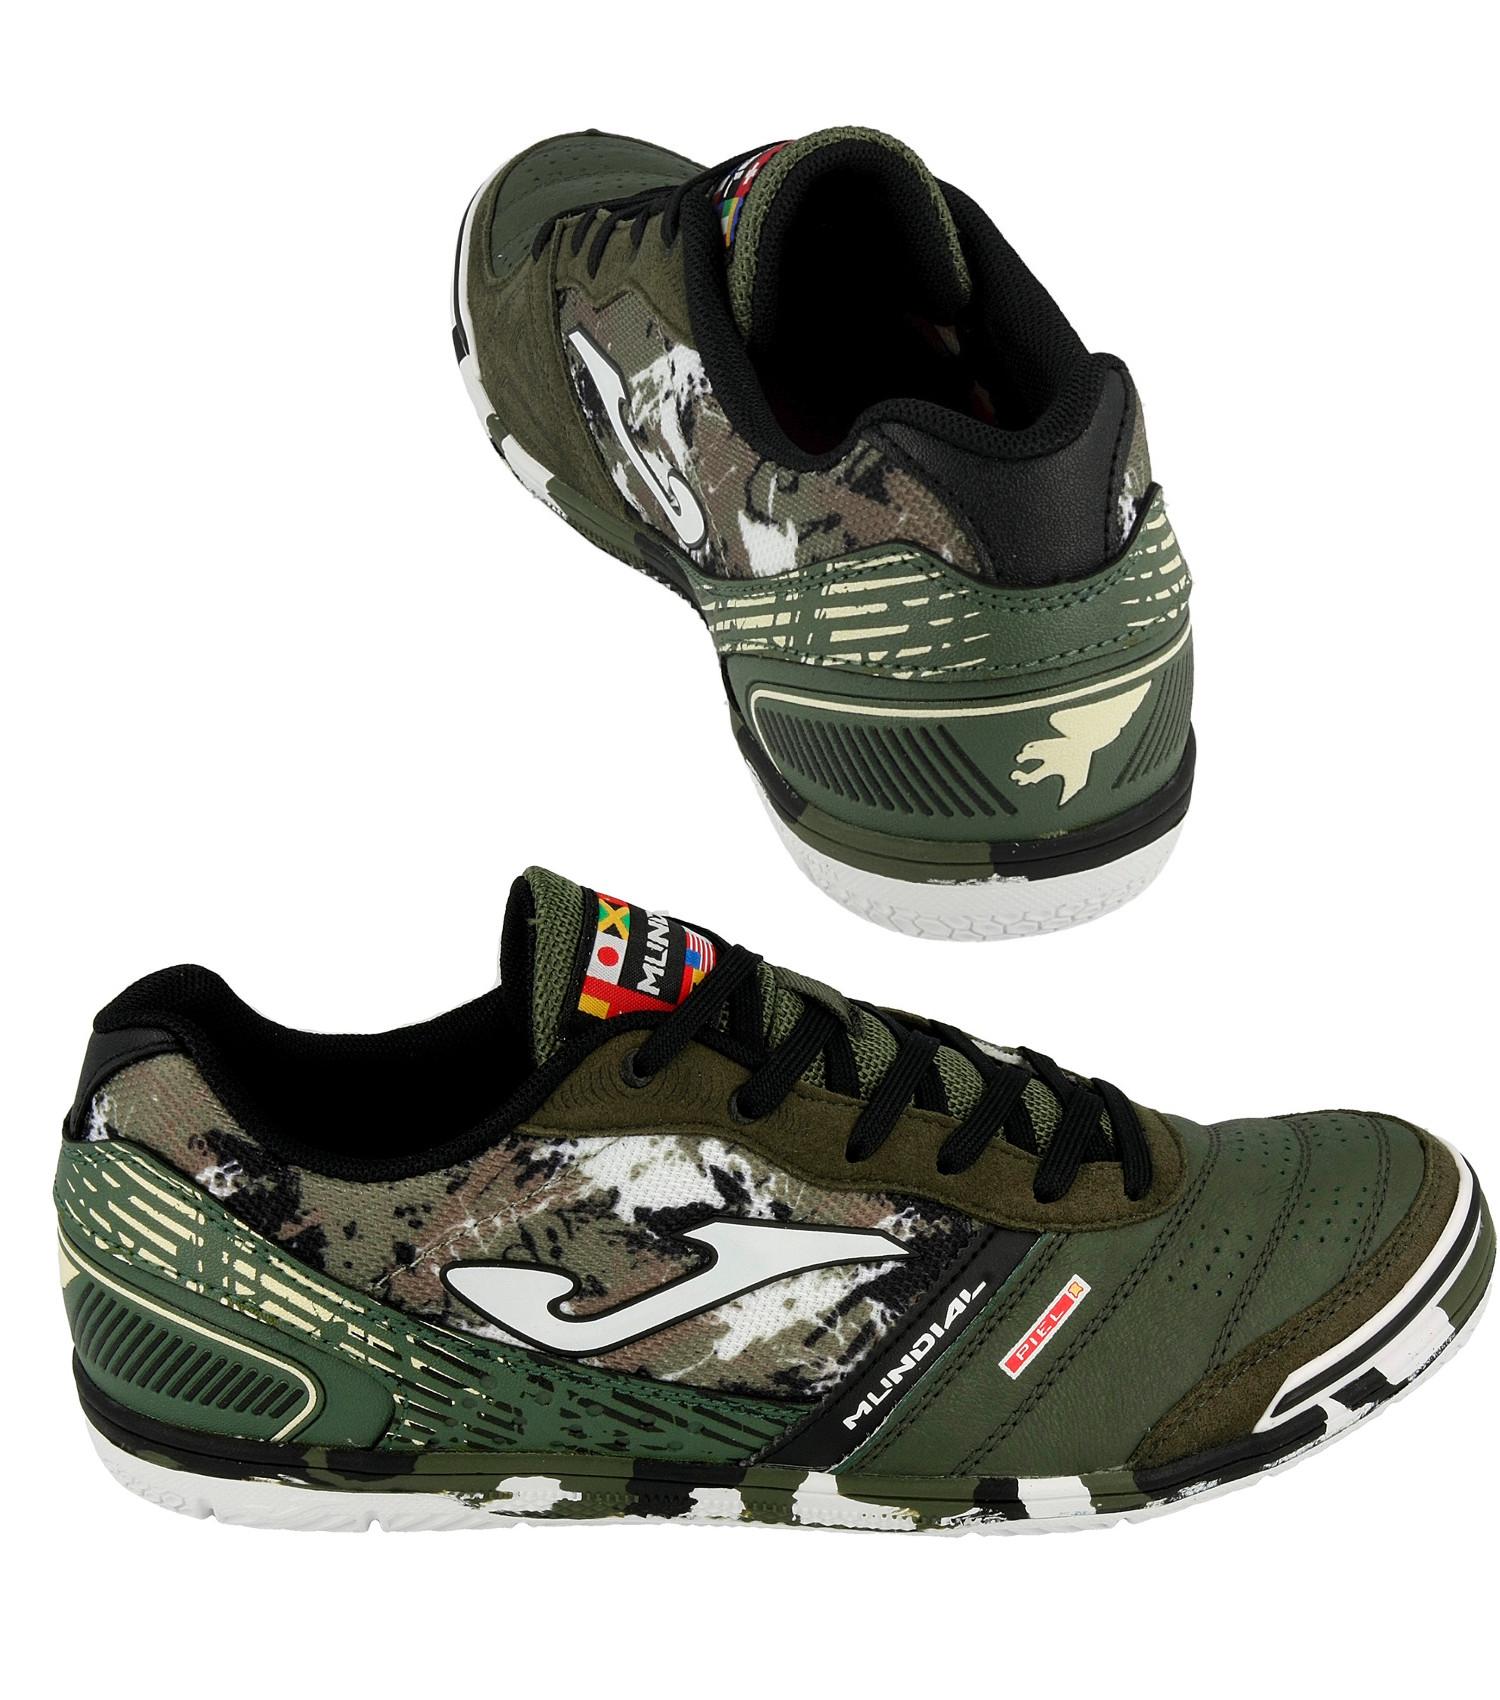 529aac037 Caricamento dell immagine in corso Football-shoes-Joma-Scarpe-Calcio-Mundial -Verde-Indoor-